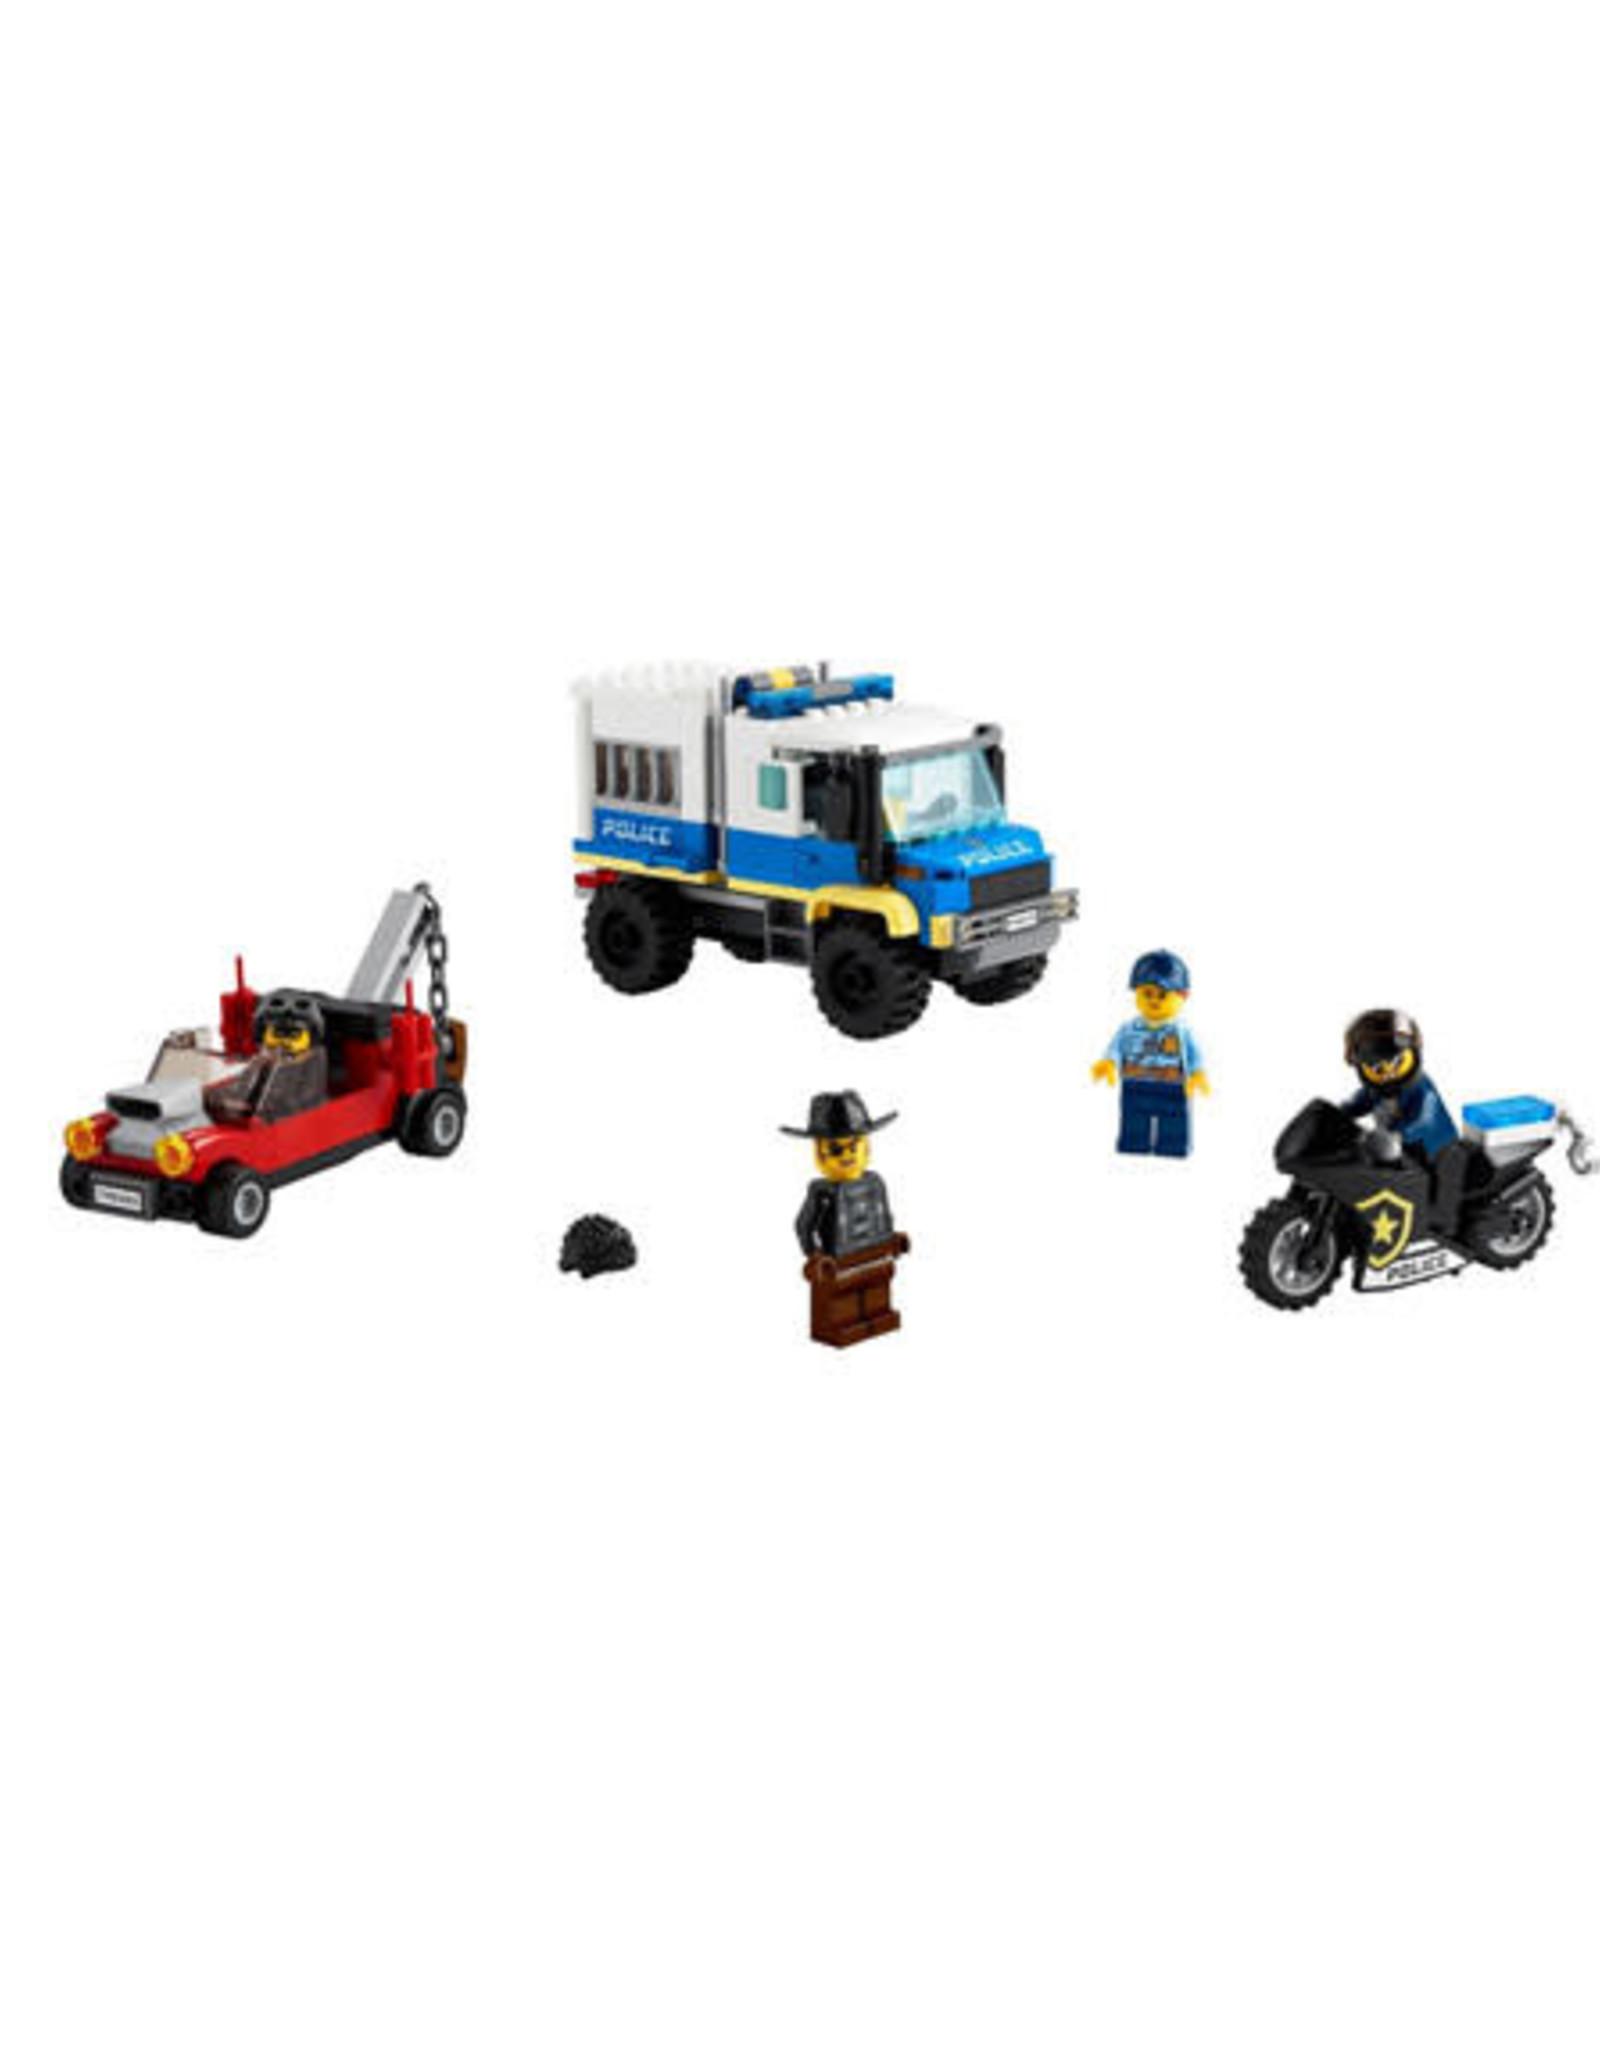 LEGO LEGO 60276 Police Prisoner Transport CITY NIEUW